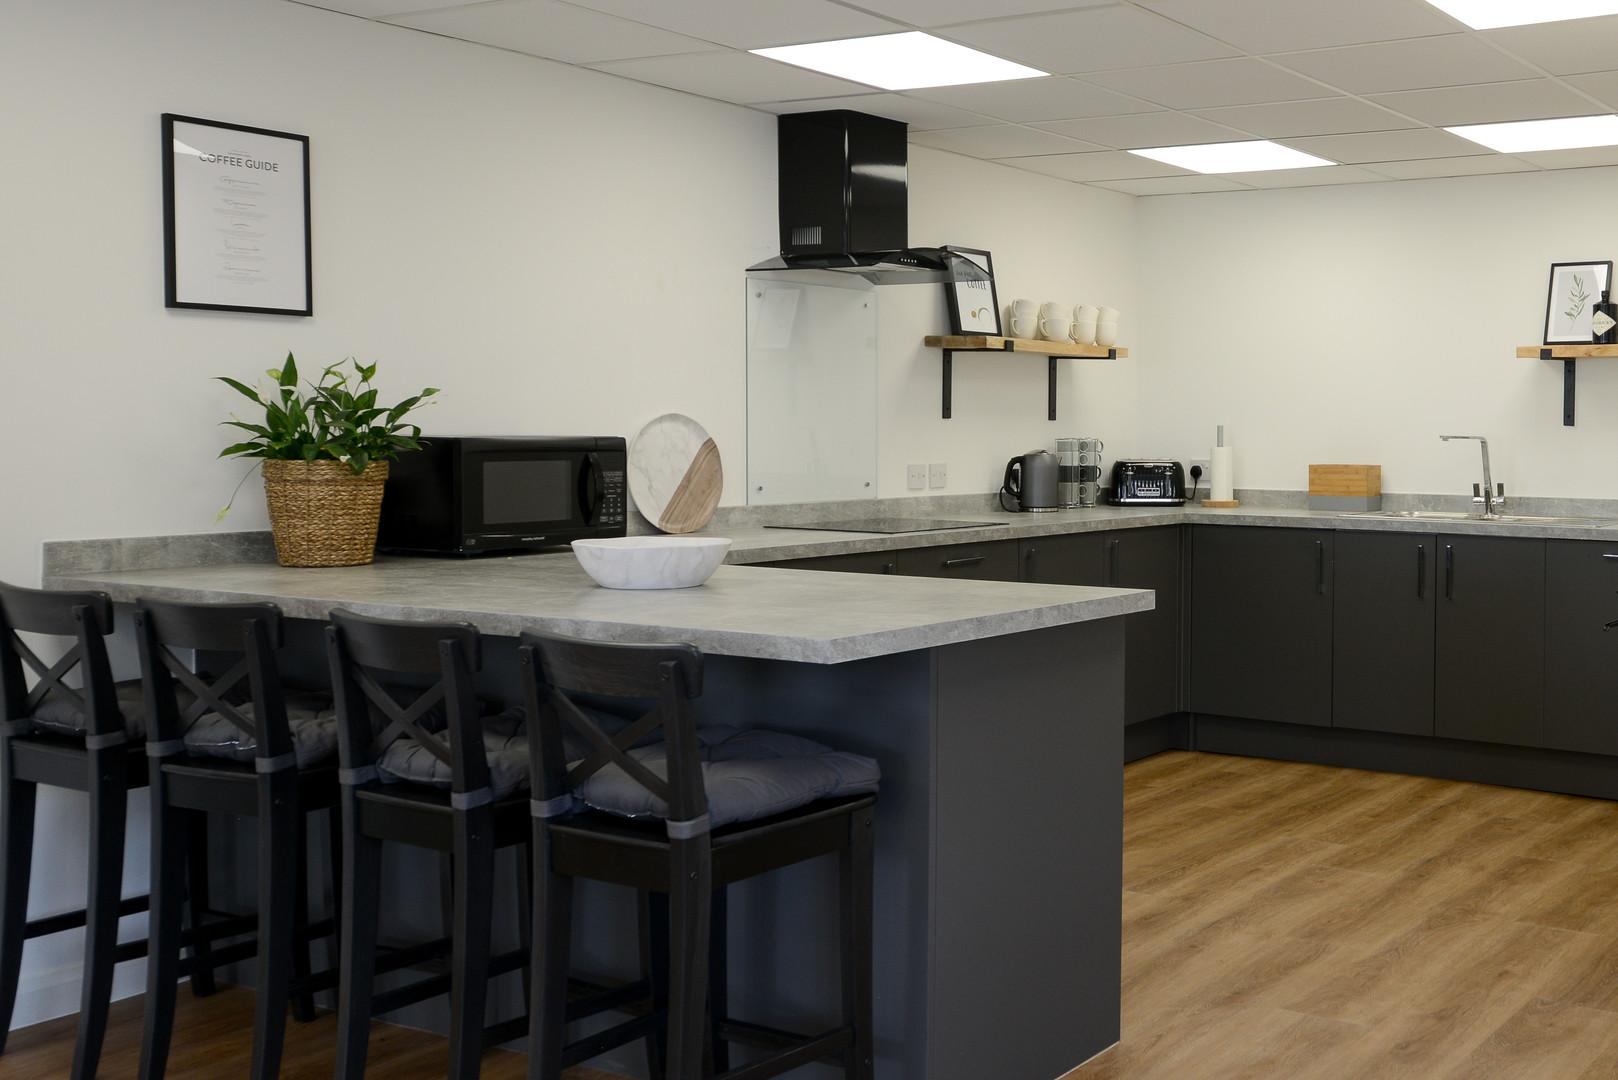 Kitchen Design - Fable Interiors